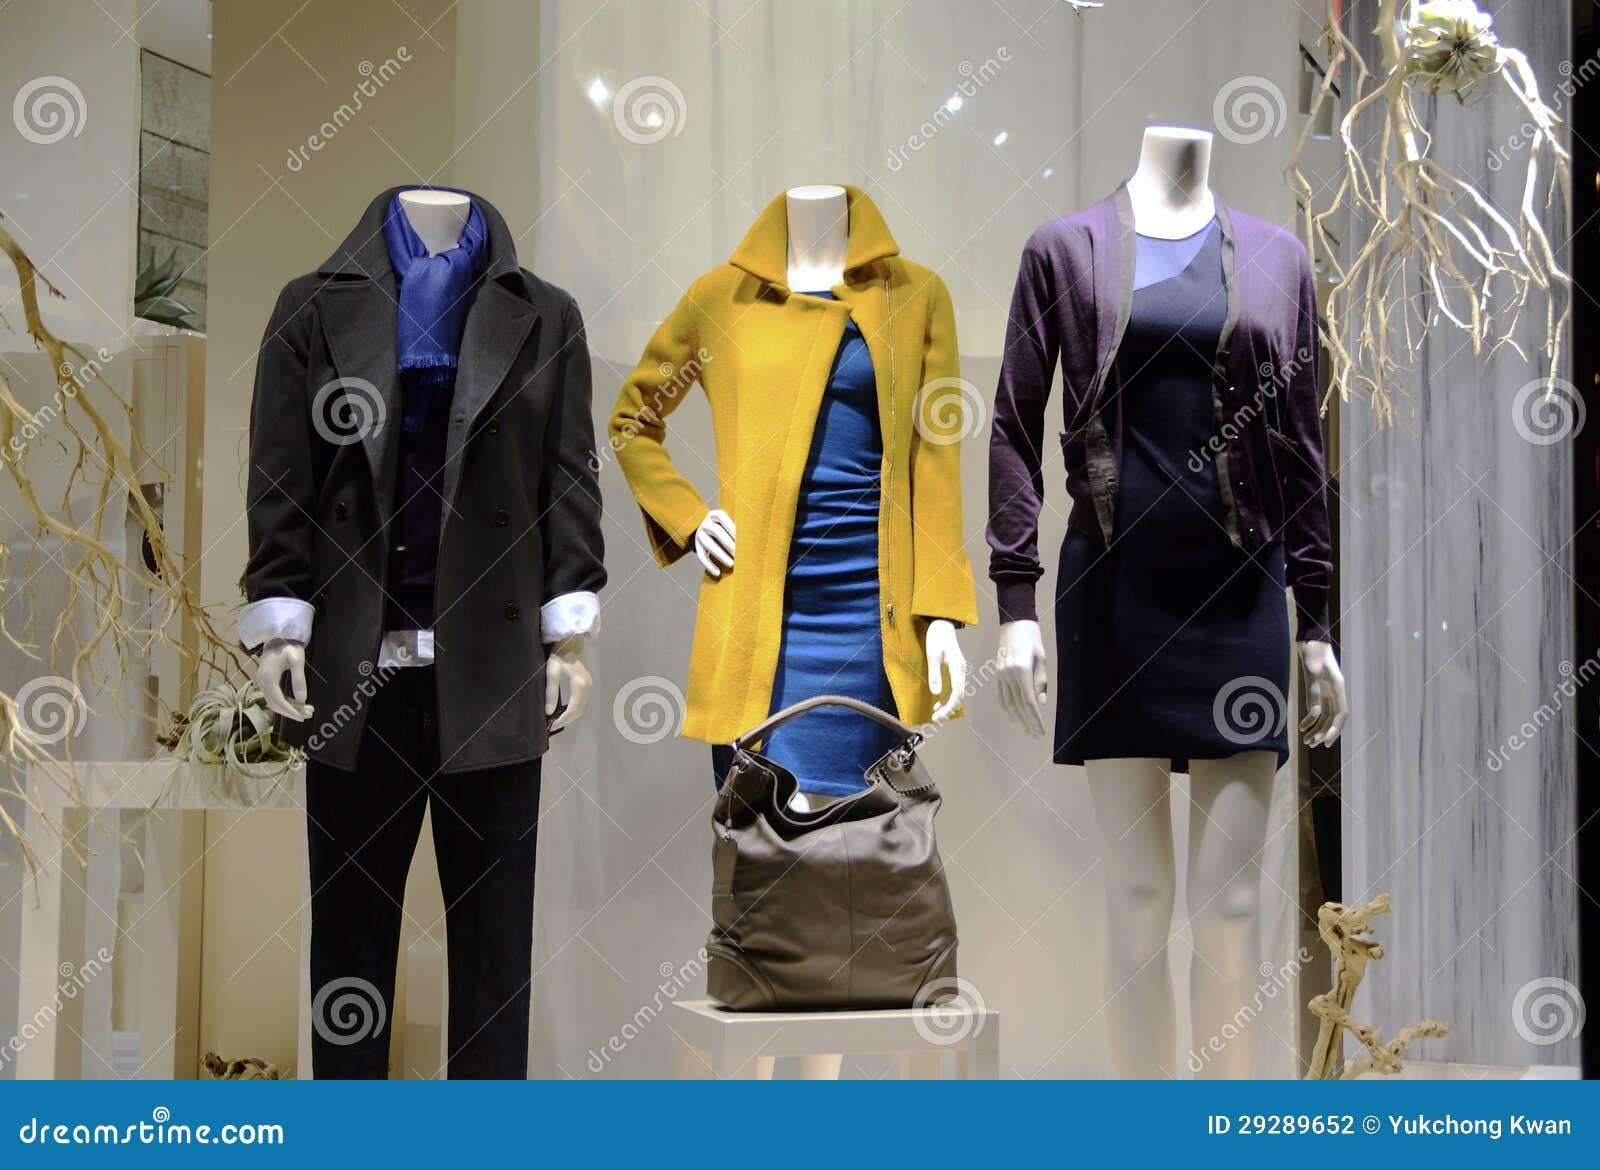 Trendy Kleding.Trendy Comfortabele Kleding Stock Foto Afbeelding Bestaande Uit